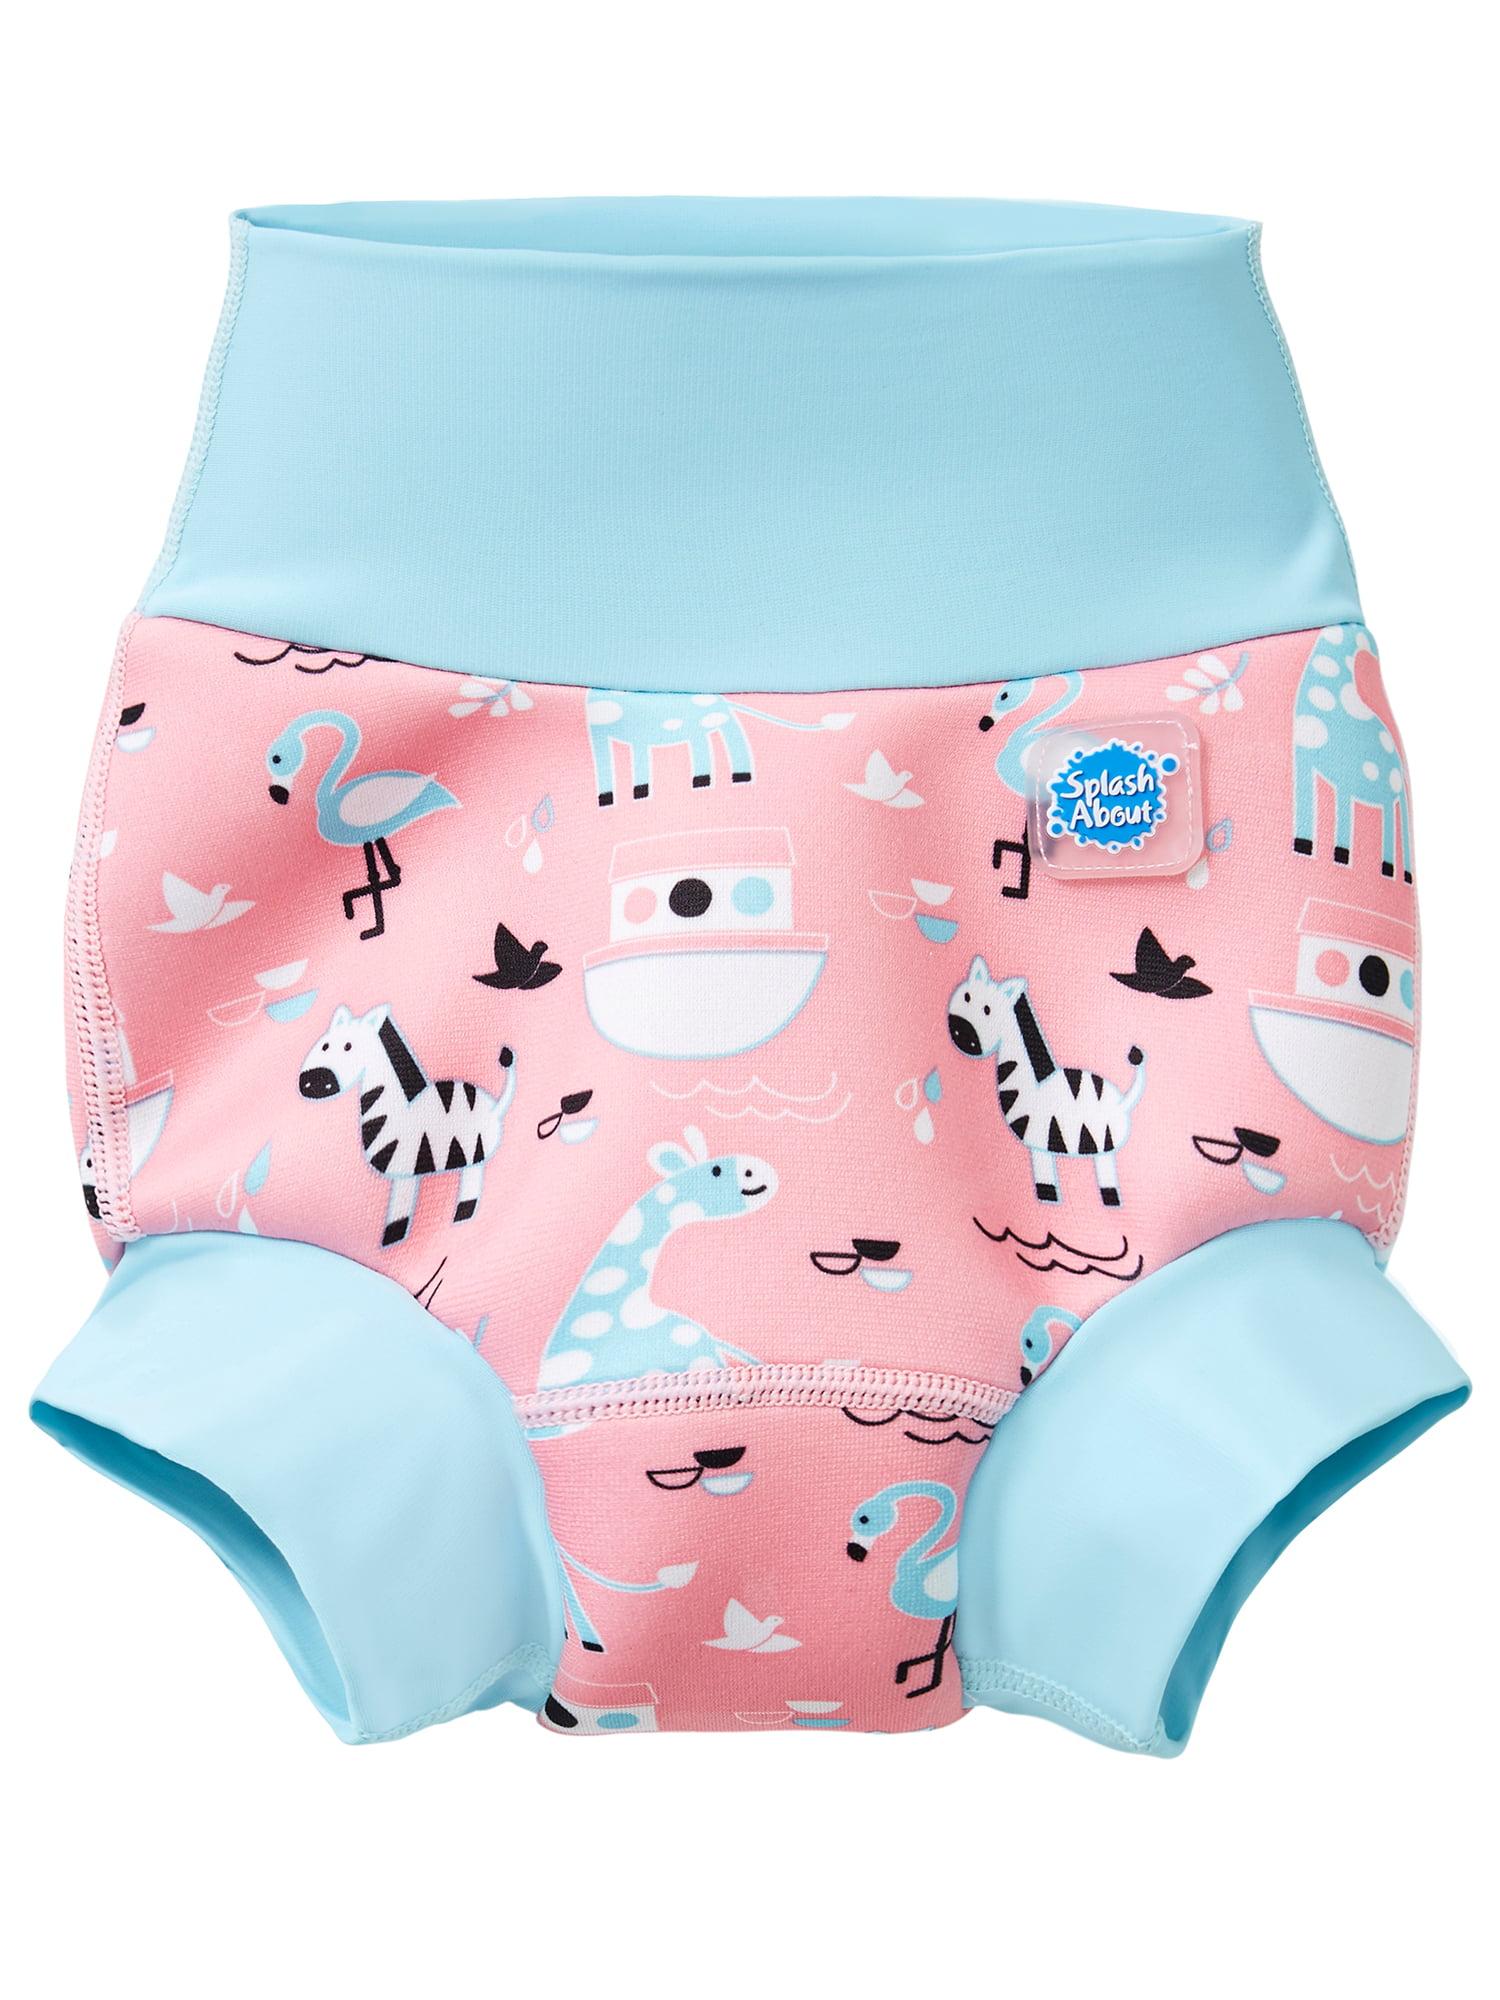 2 Pack Two Bare Feet Reusable Swim Nappy//Swim Shorts Neoprene Lycra Swim Nappy: Mint, S 6-12months